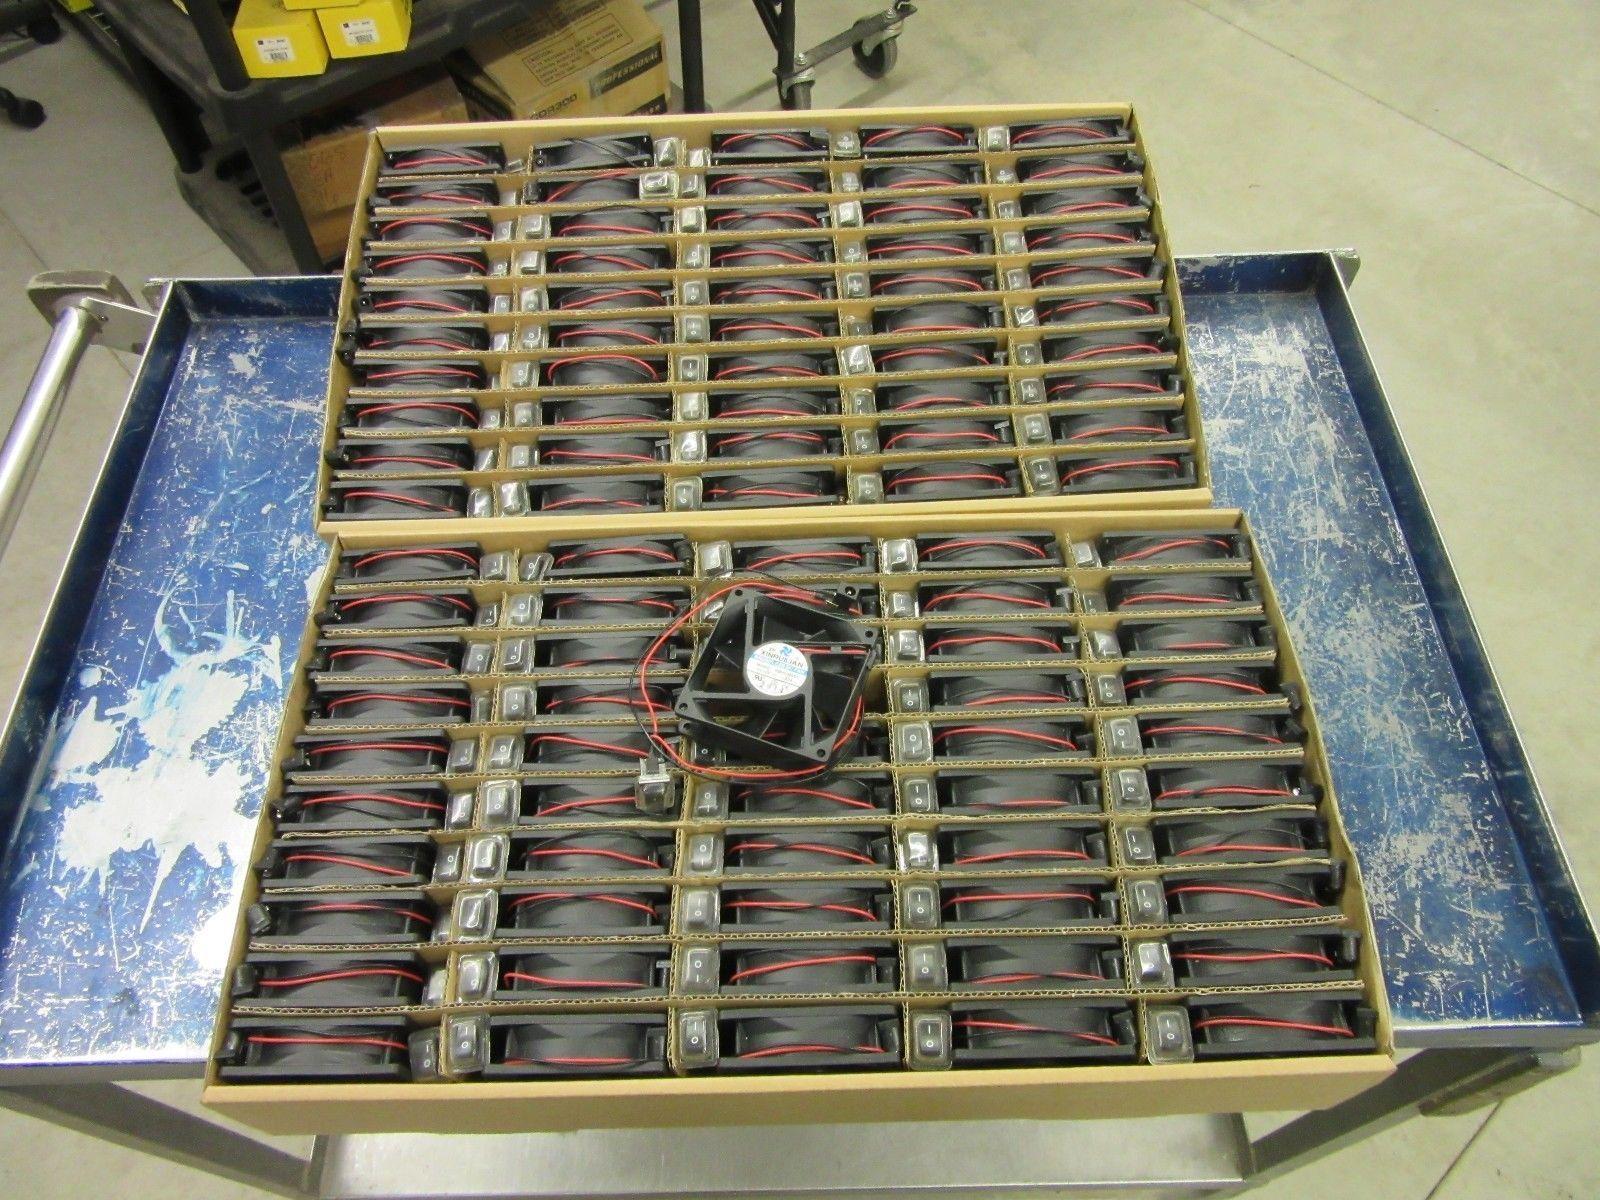 100 XINRUILIAN ZP SERVER CABINET COMPUTER CASE COOLING FAN 12V DC BRUSHLESS  NEW